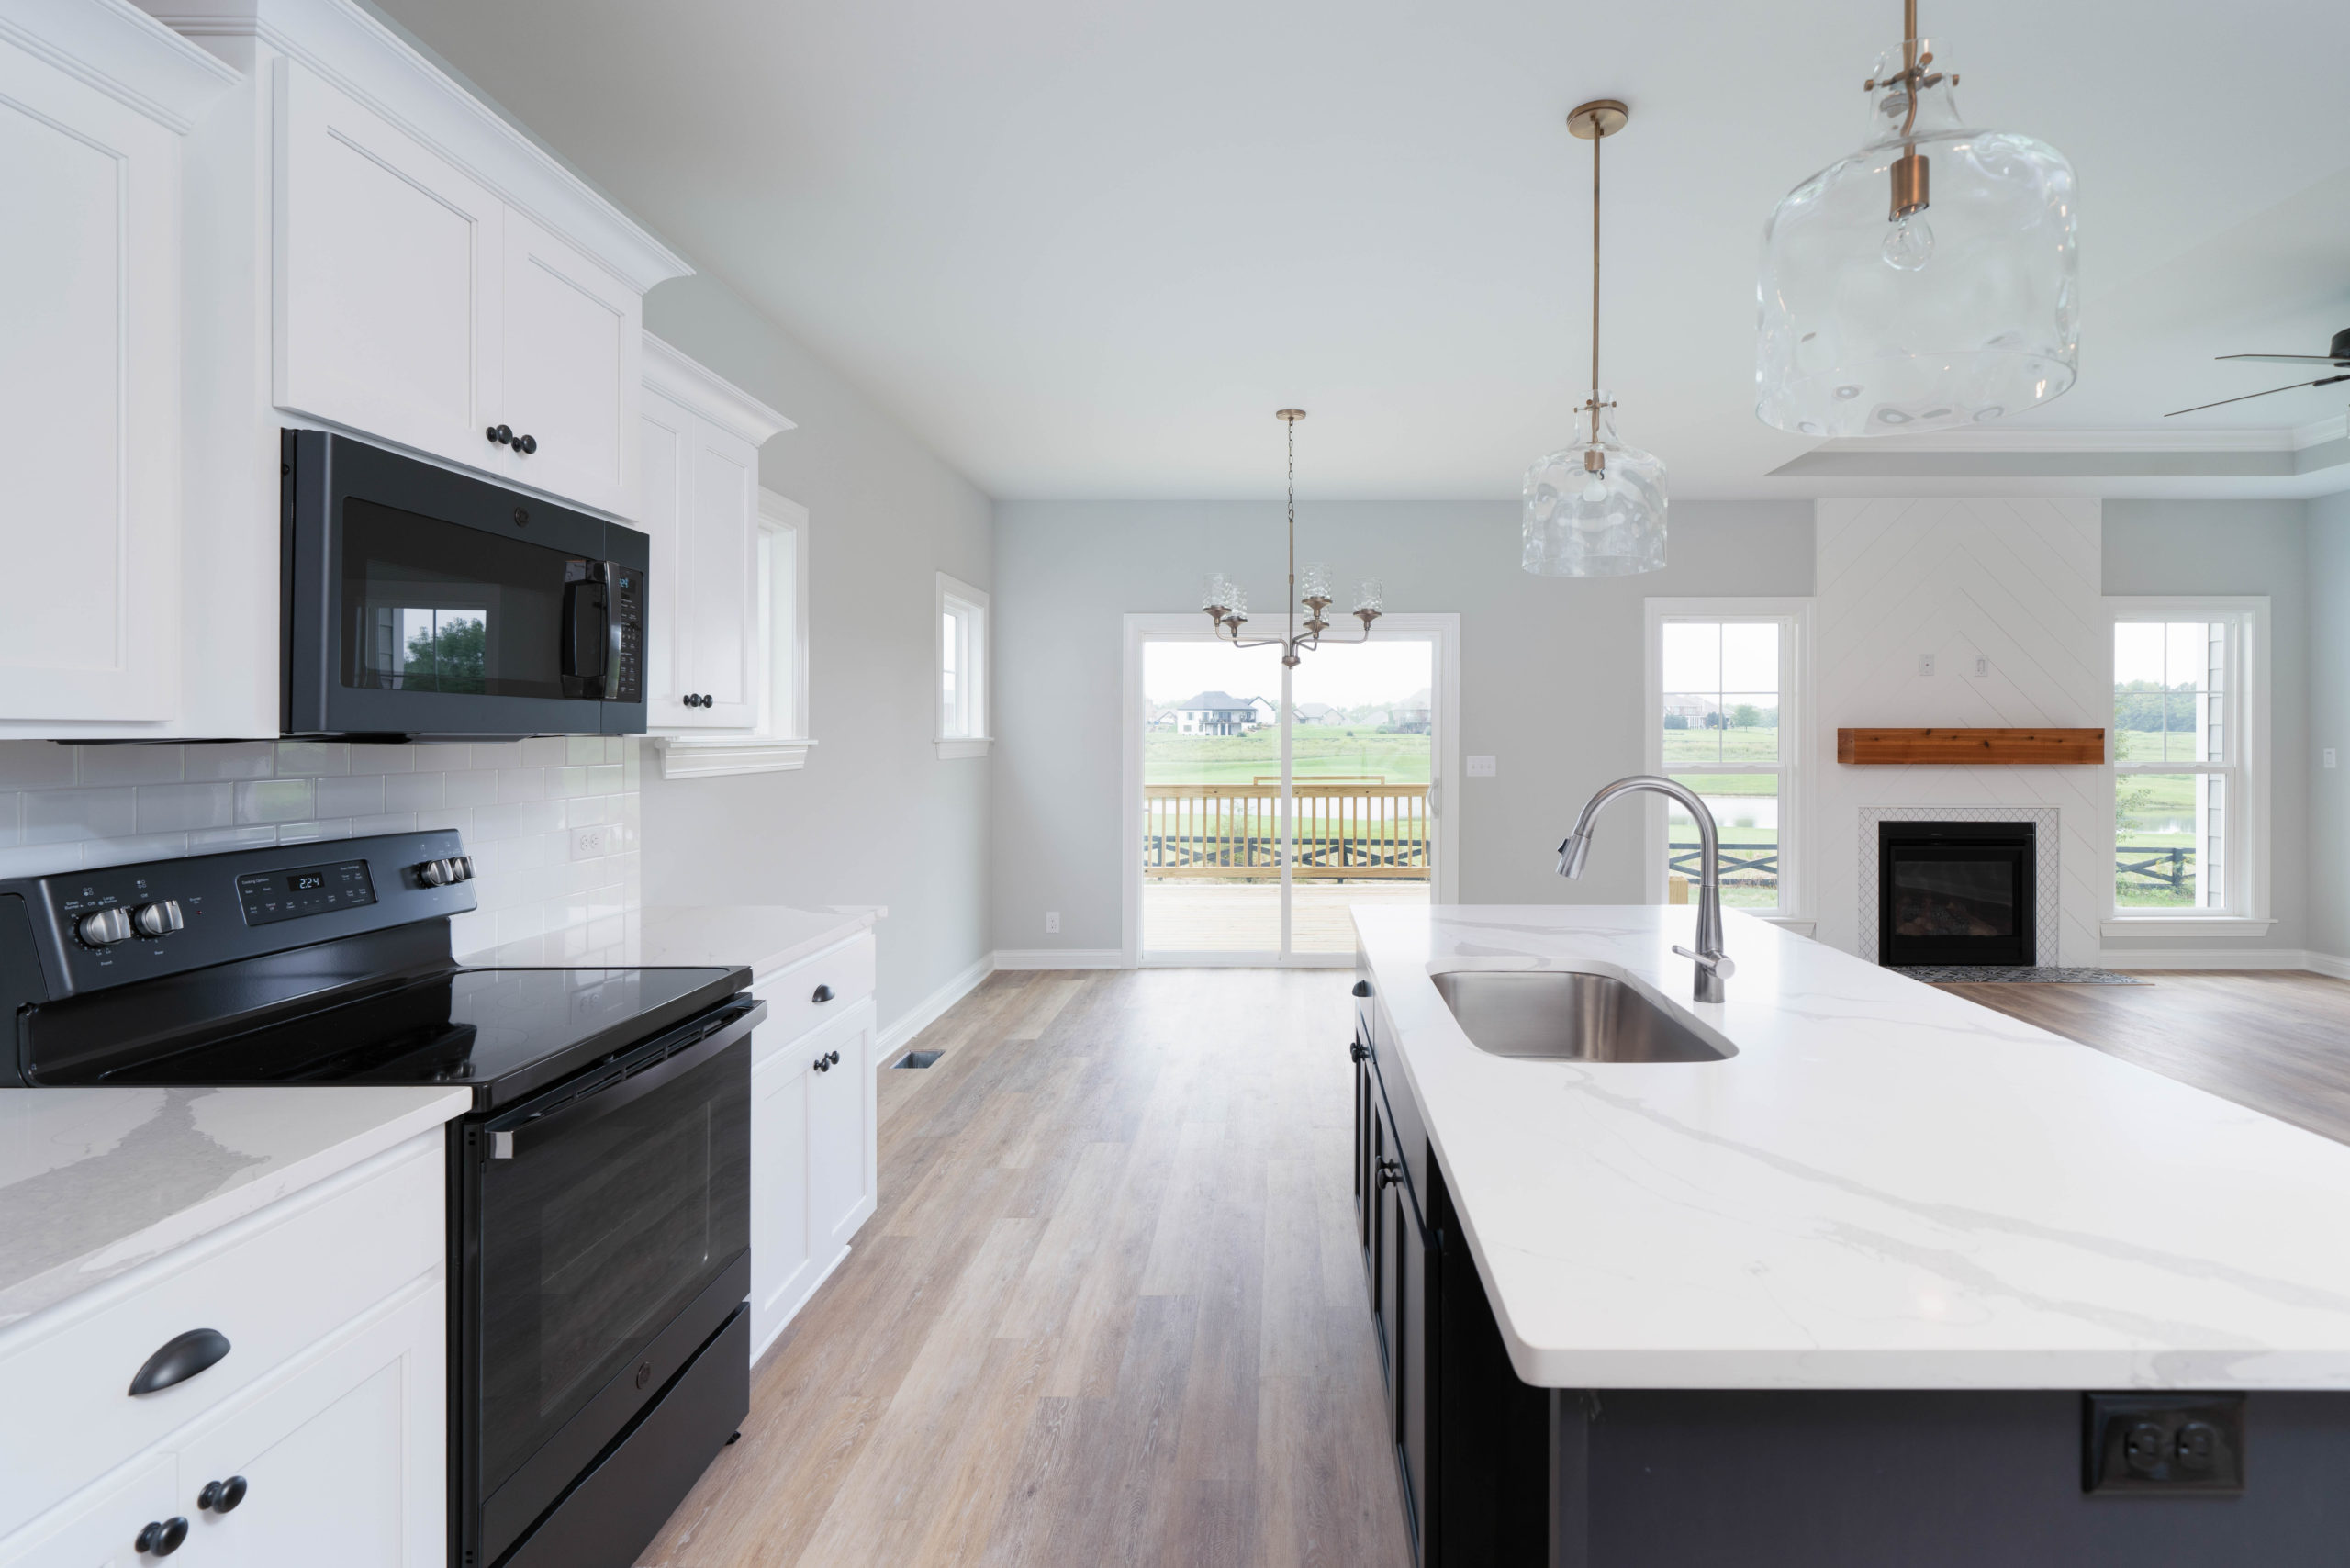 black and white custom kitchen with hardwood floors